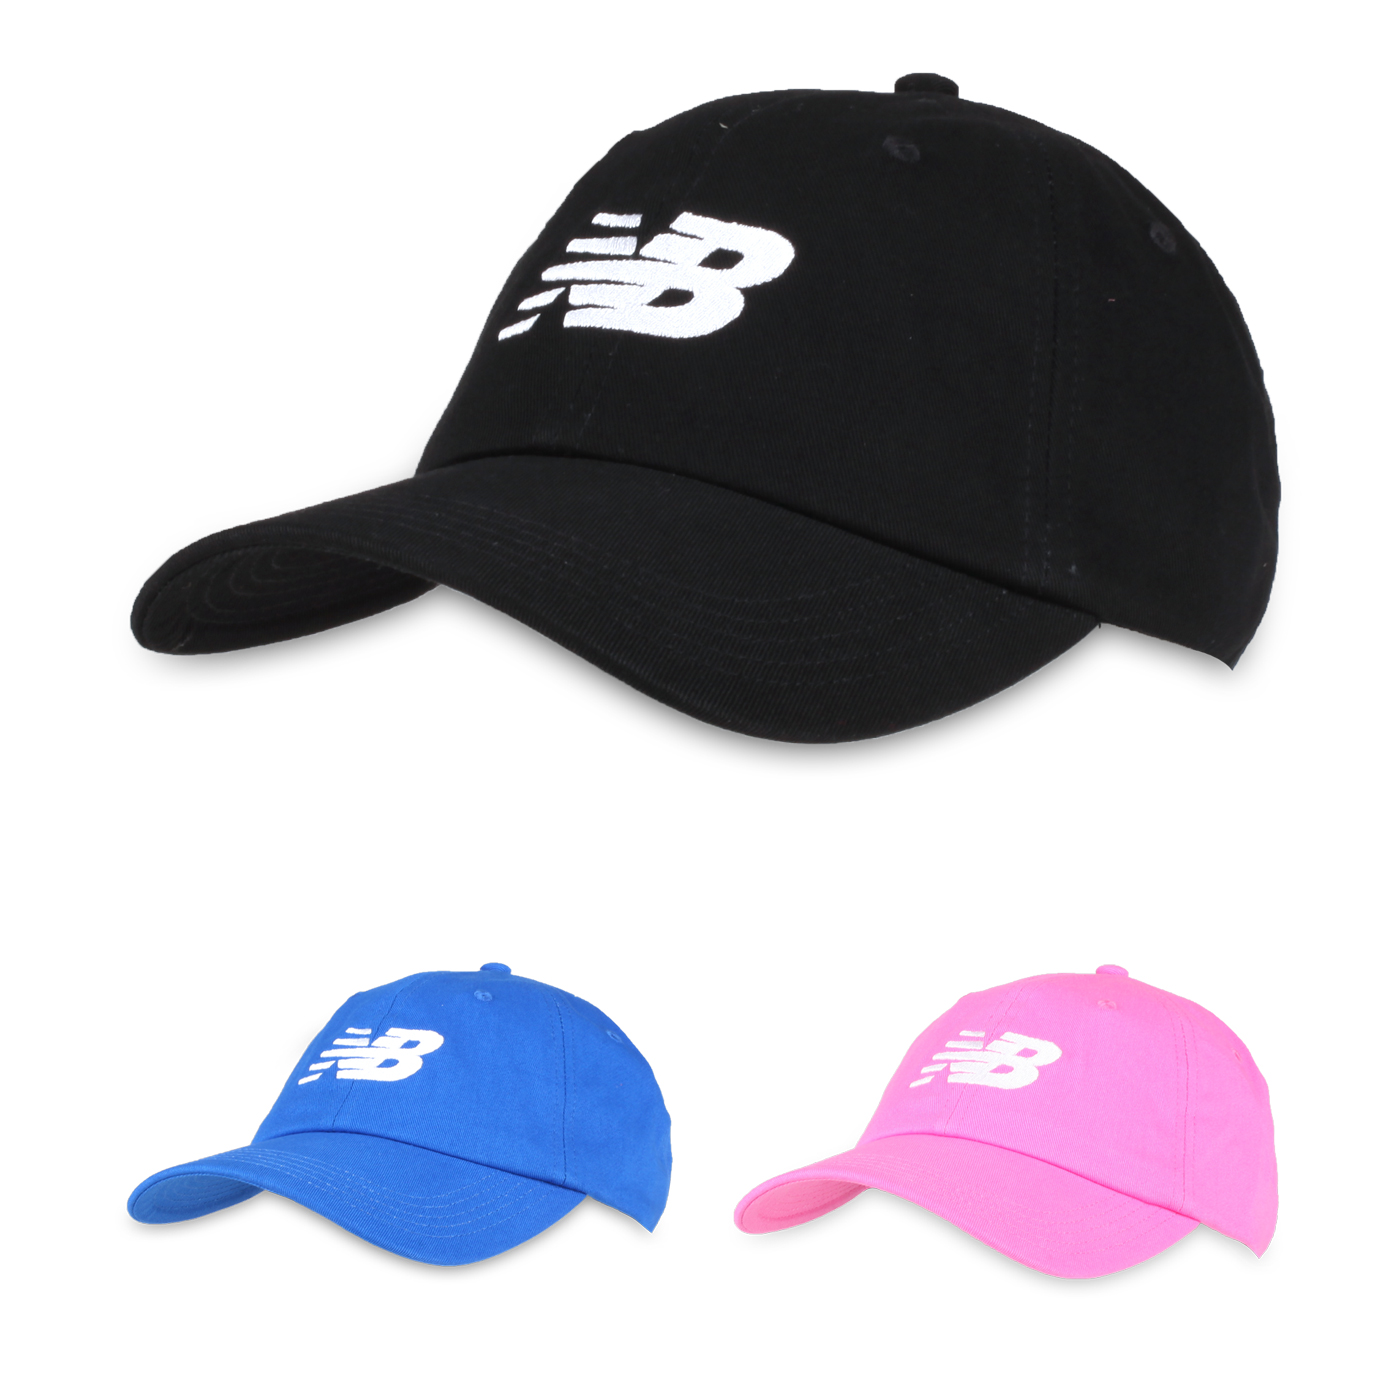 NEW BALANCE 棒球帽 LAH91017BK